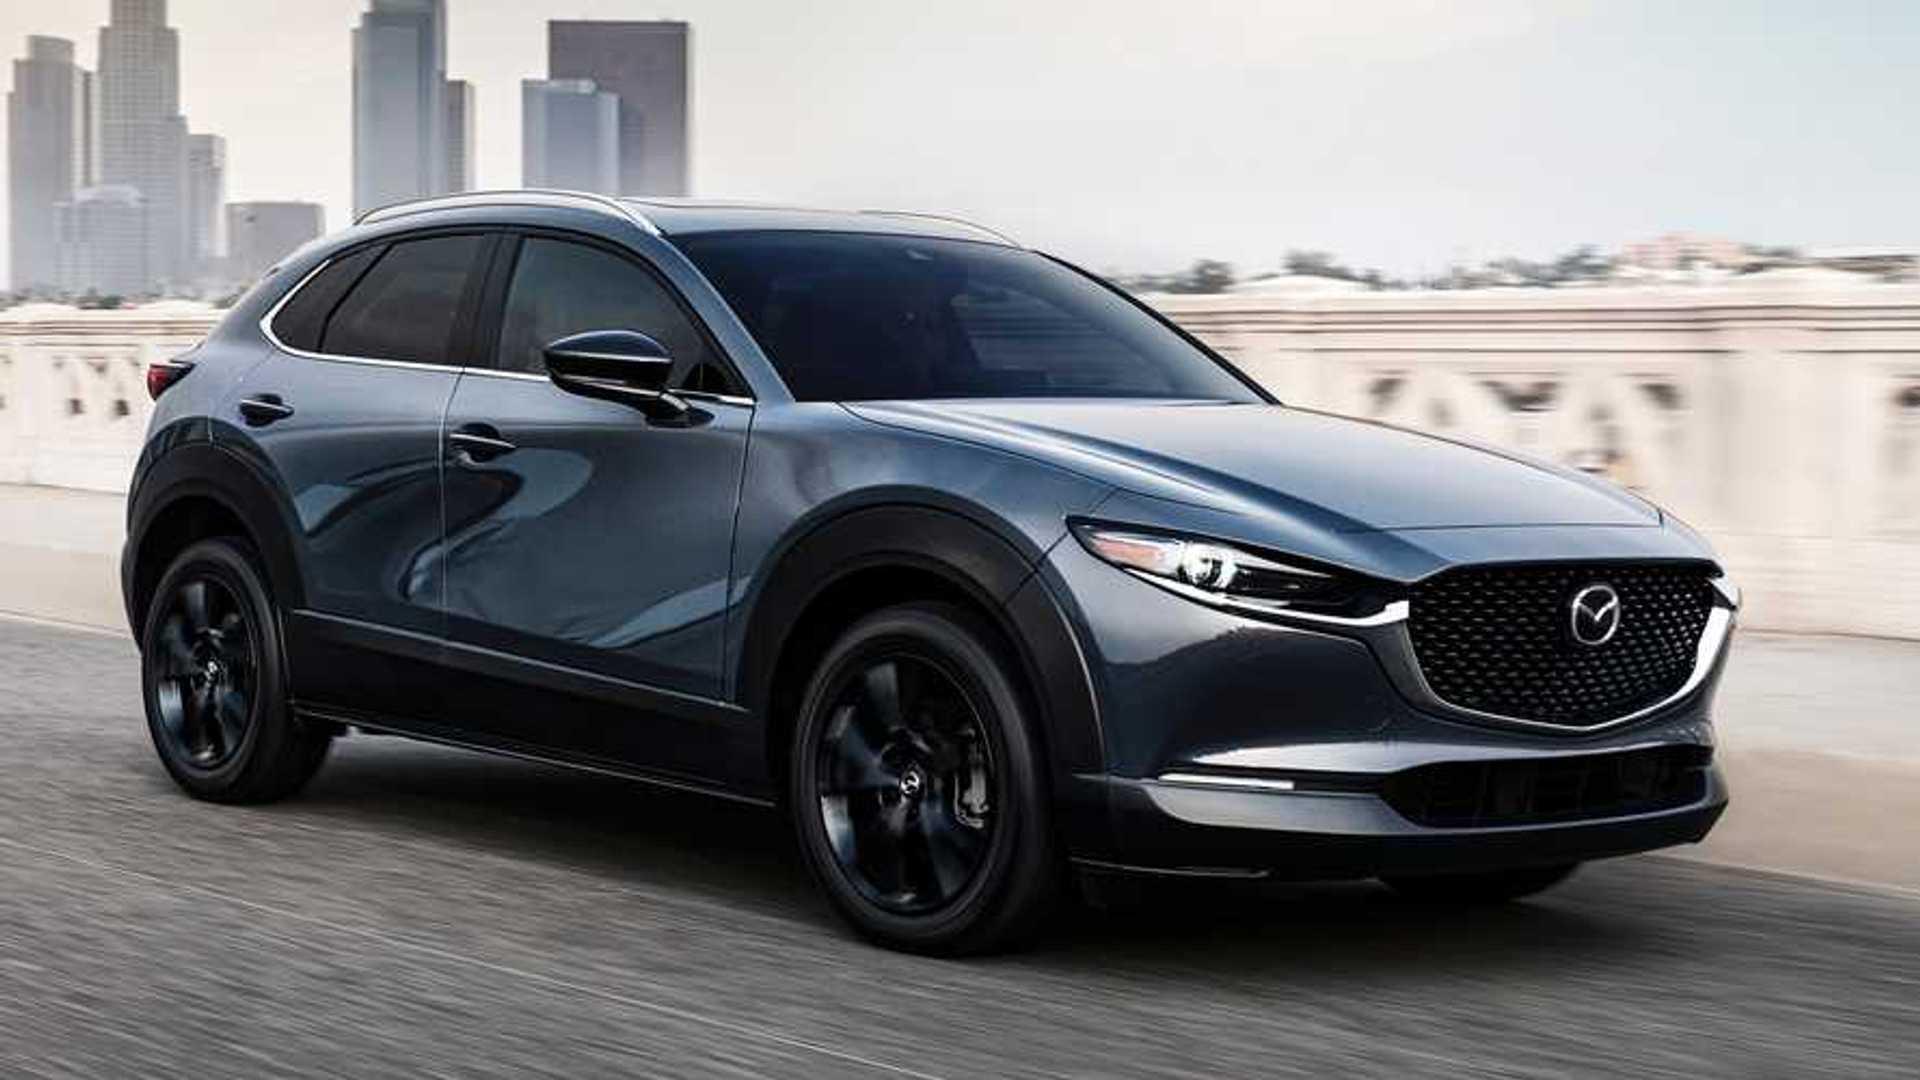 Kelebihan Harga Mazda Tangguh